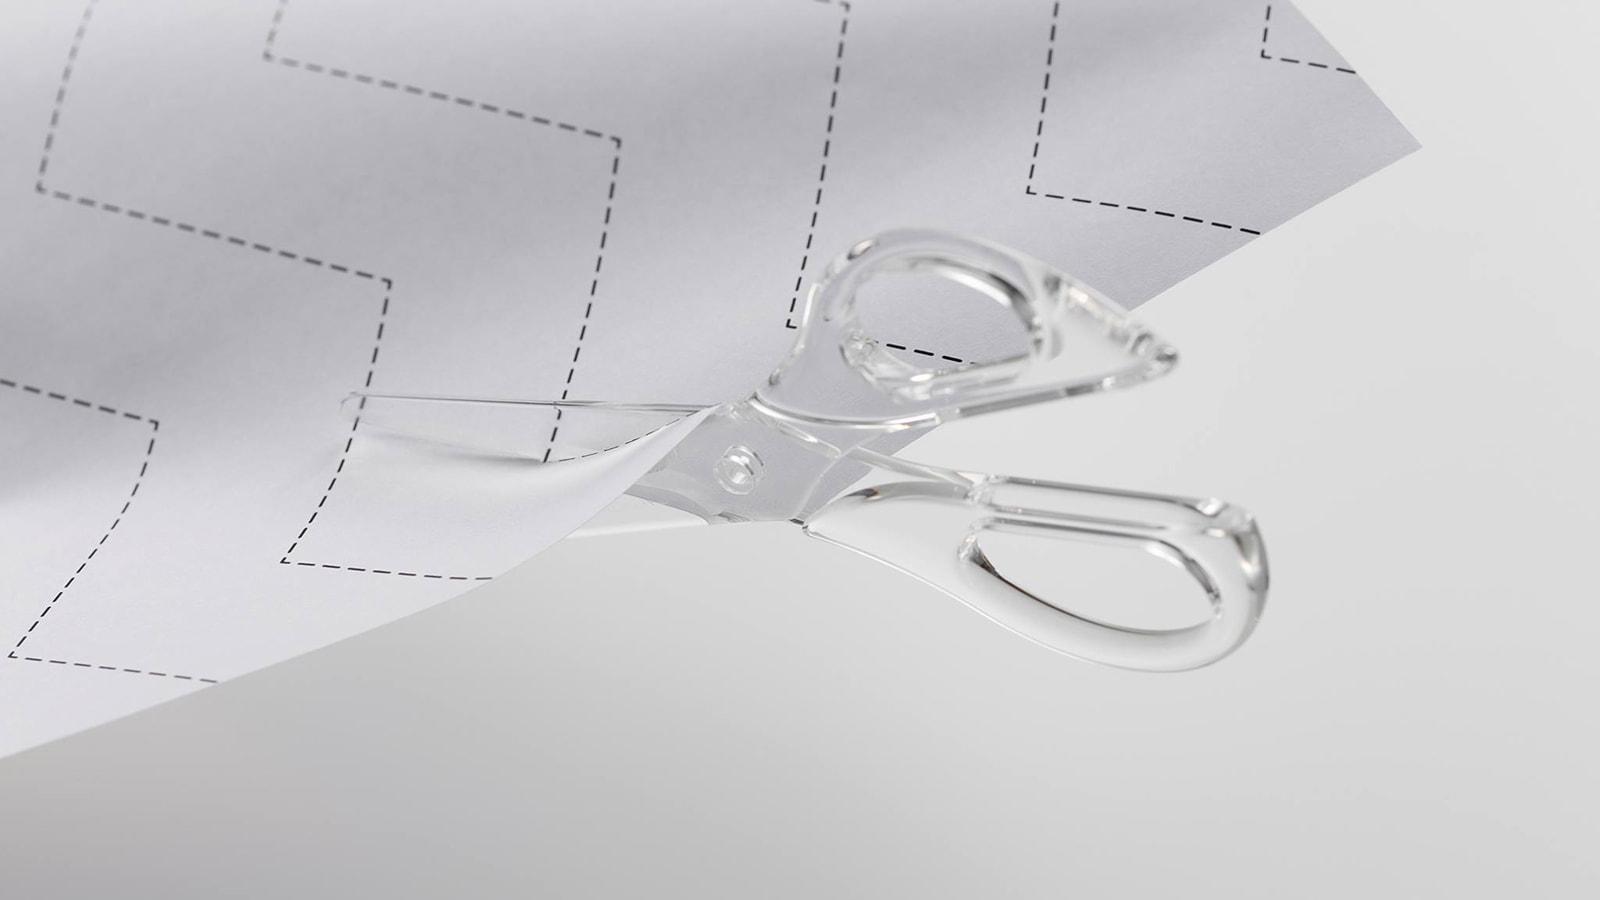 transparente schere